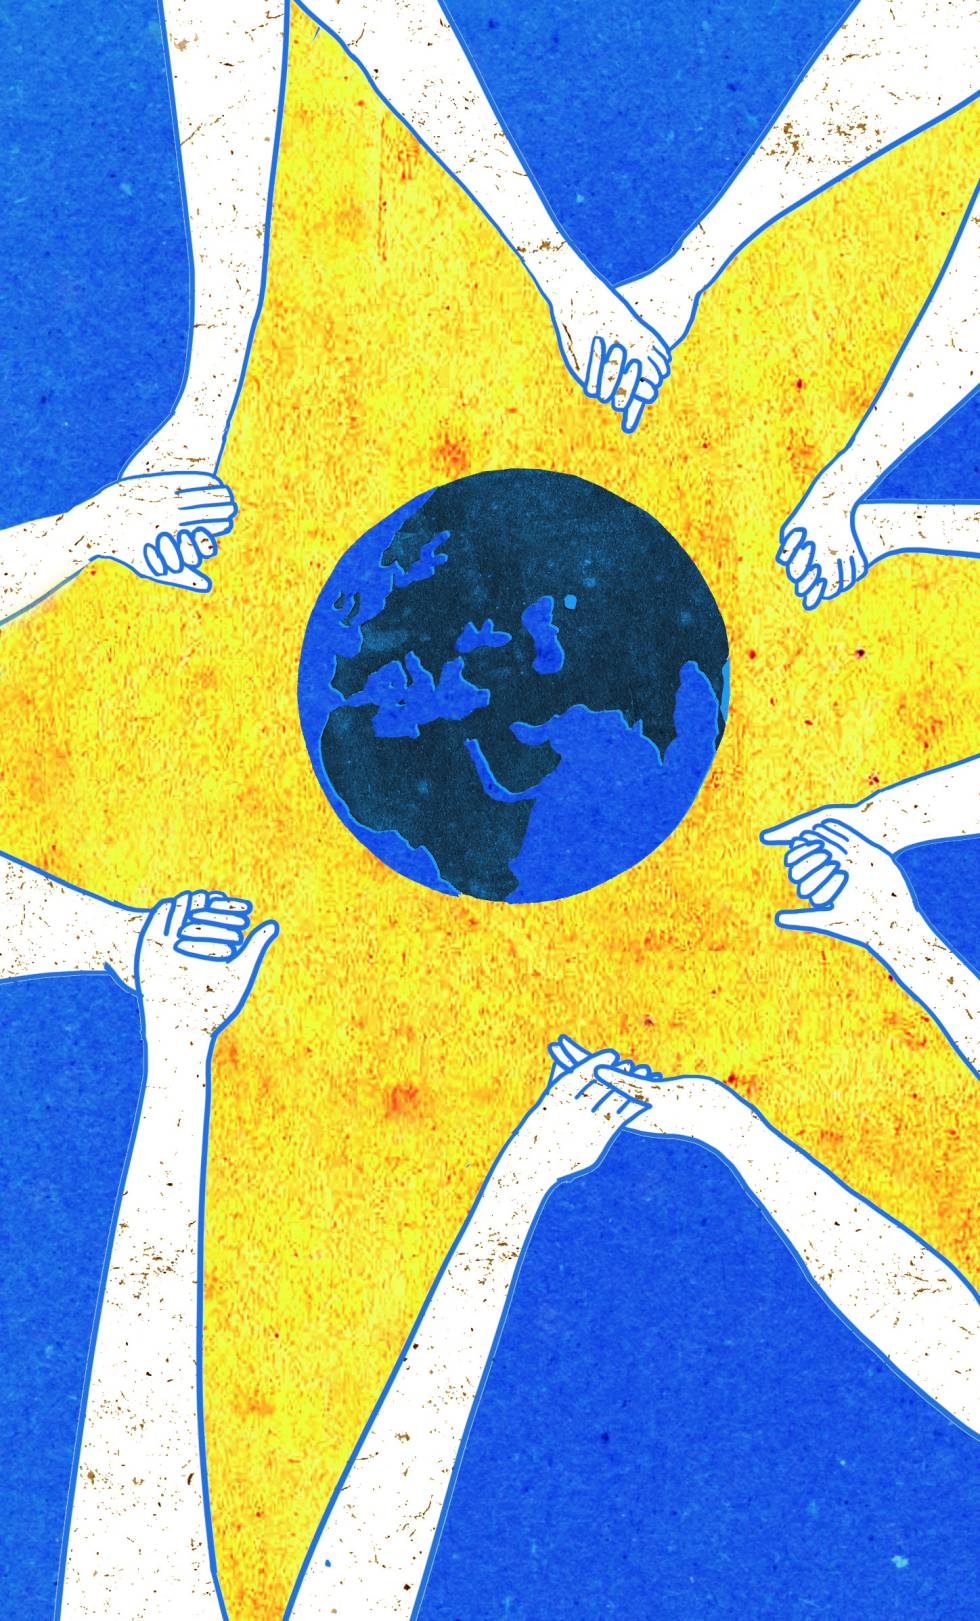 Una estrategia para unir Europa